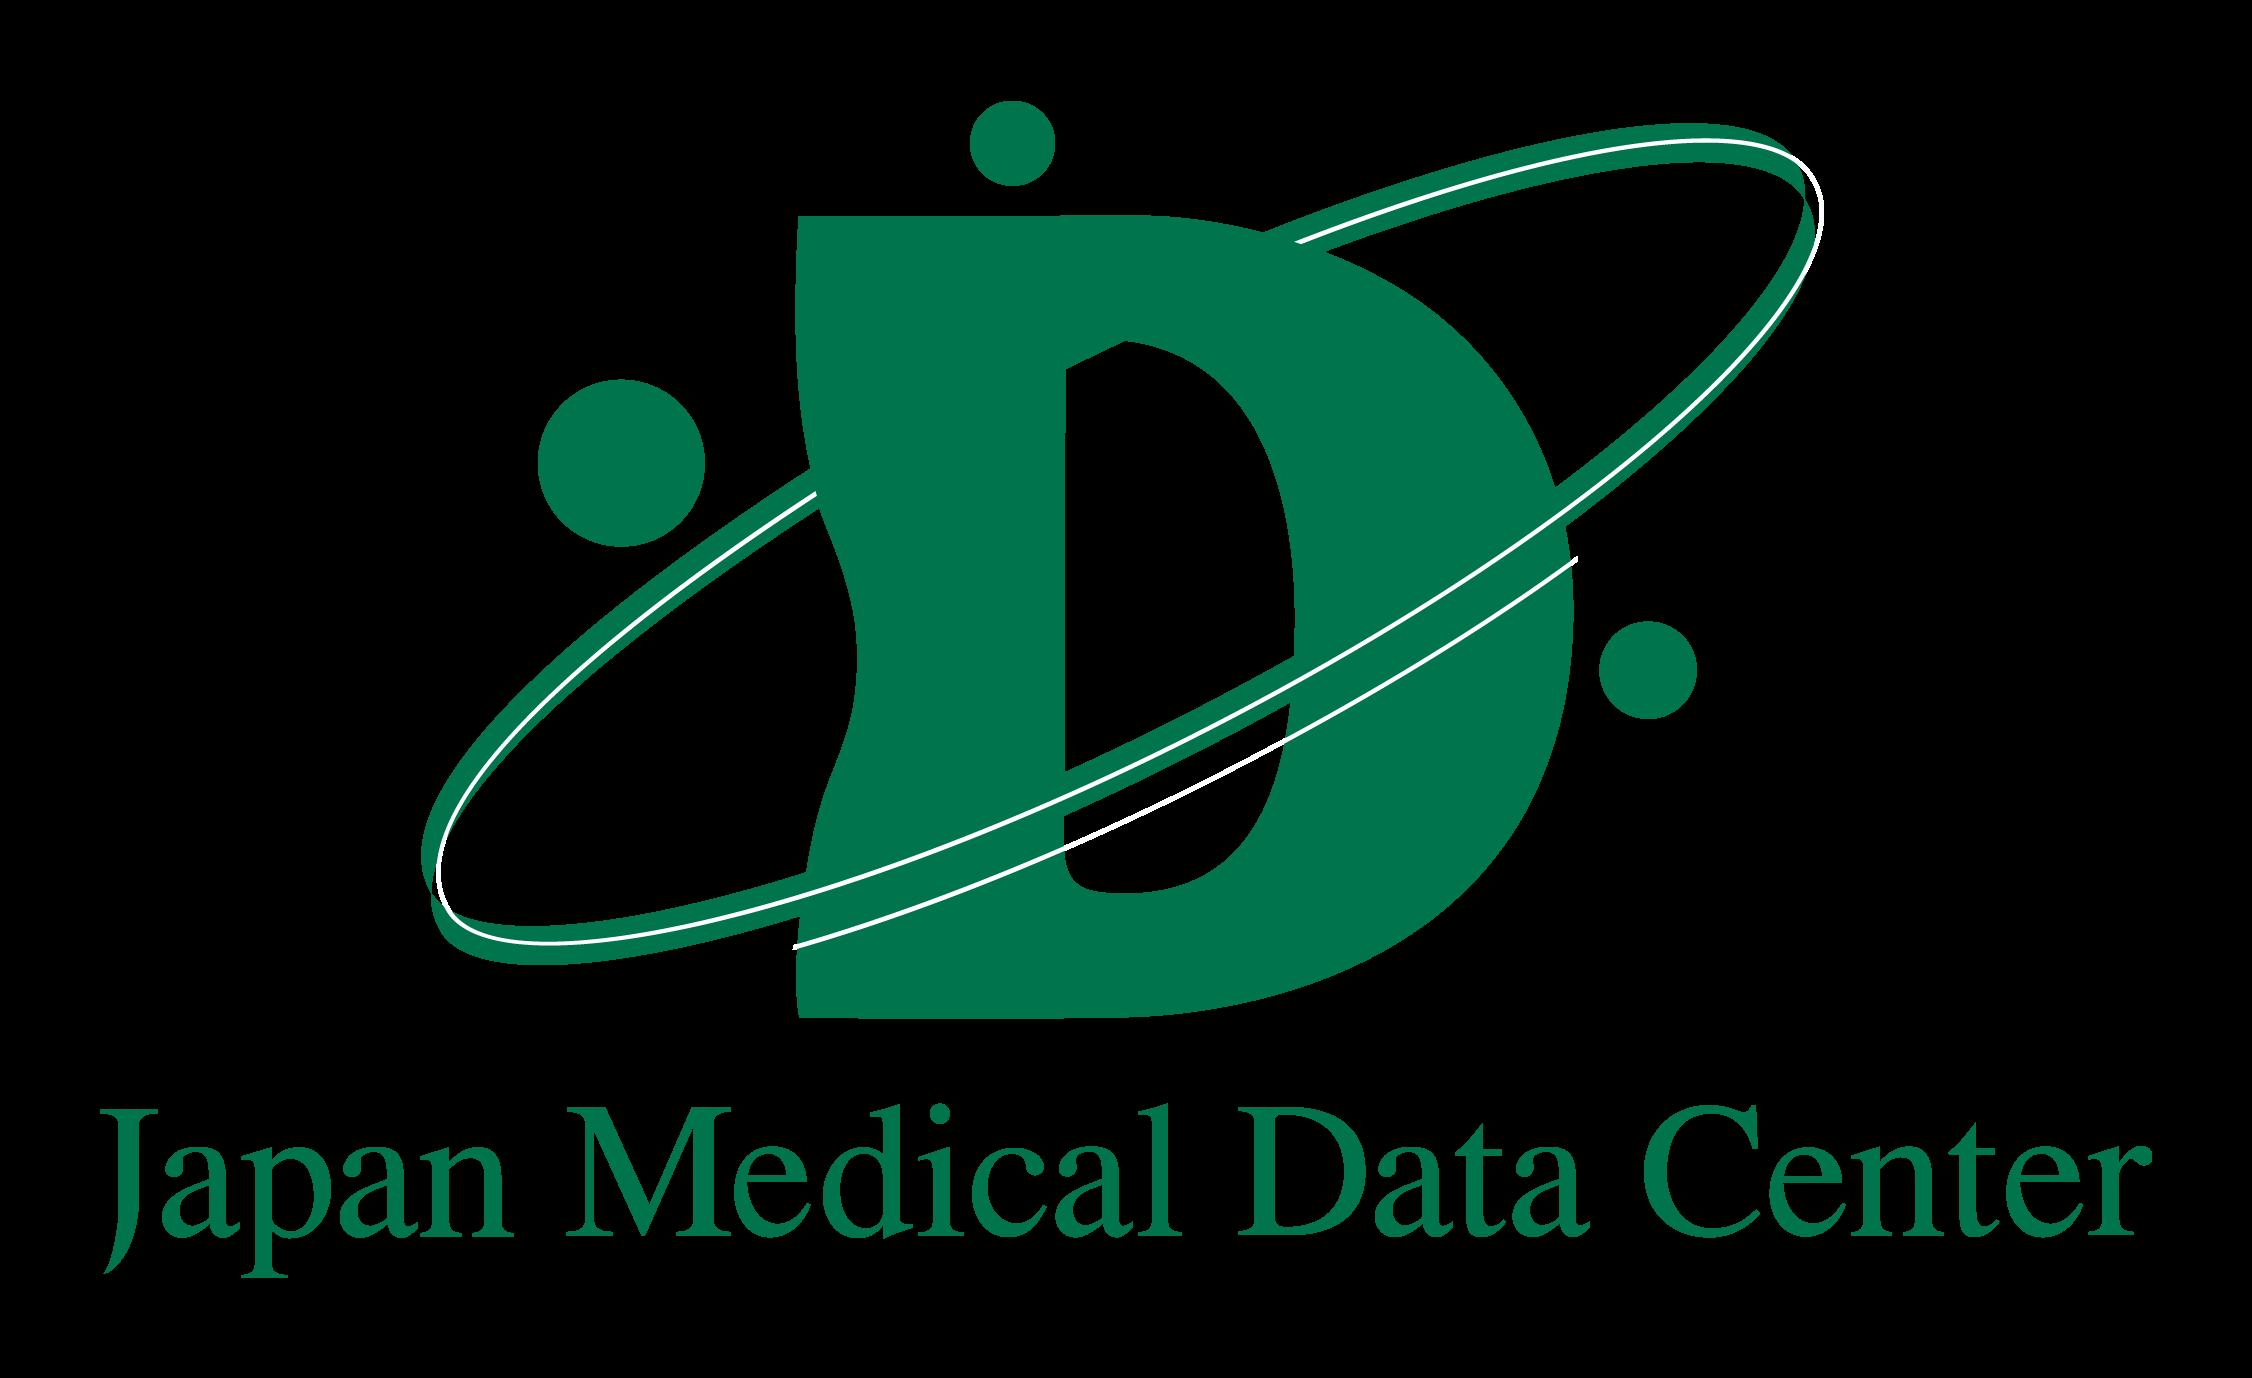 Japan Medical Data Center Logo